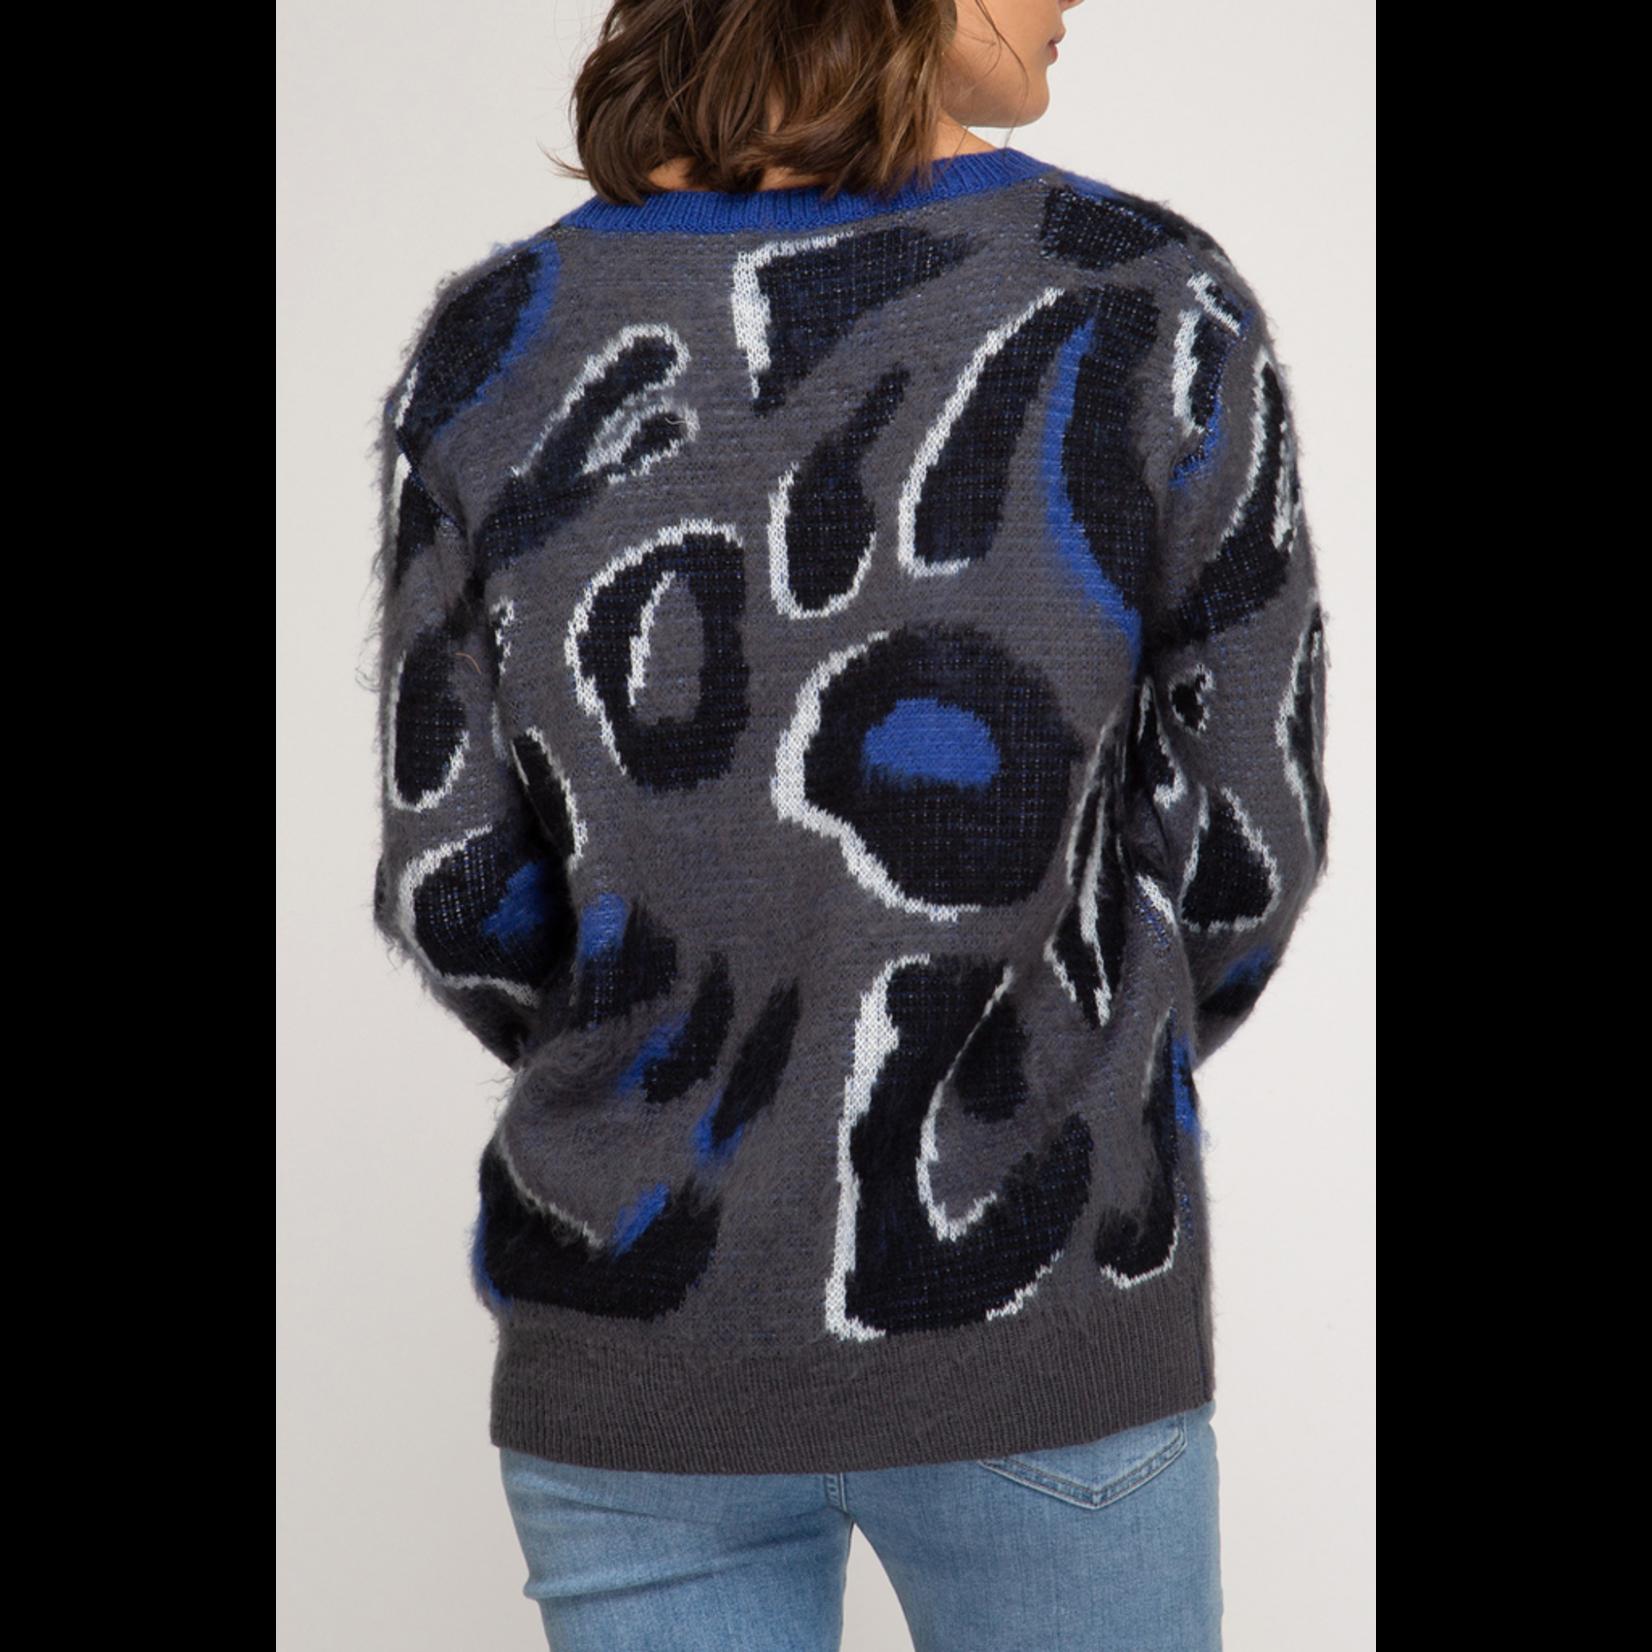 She & Sky Leopard Print Sweater